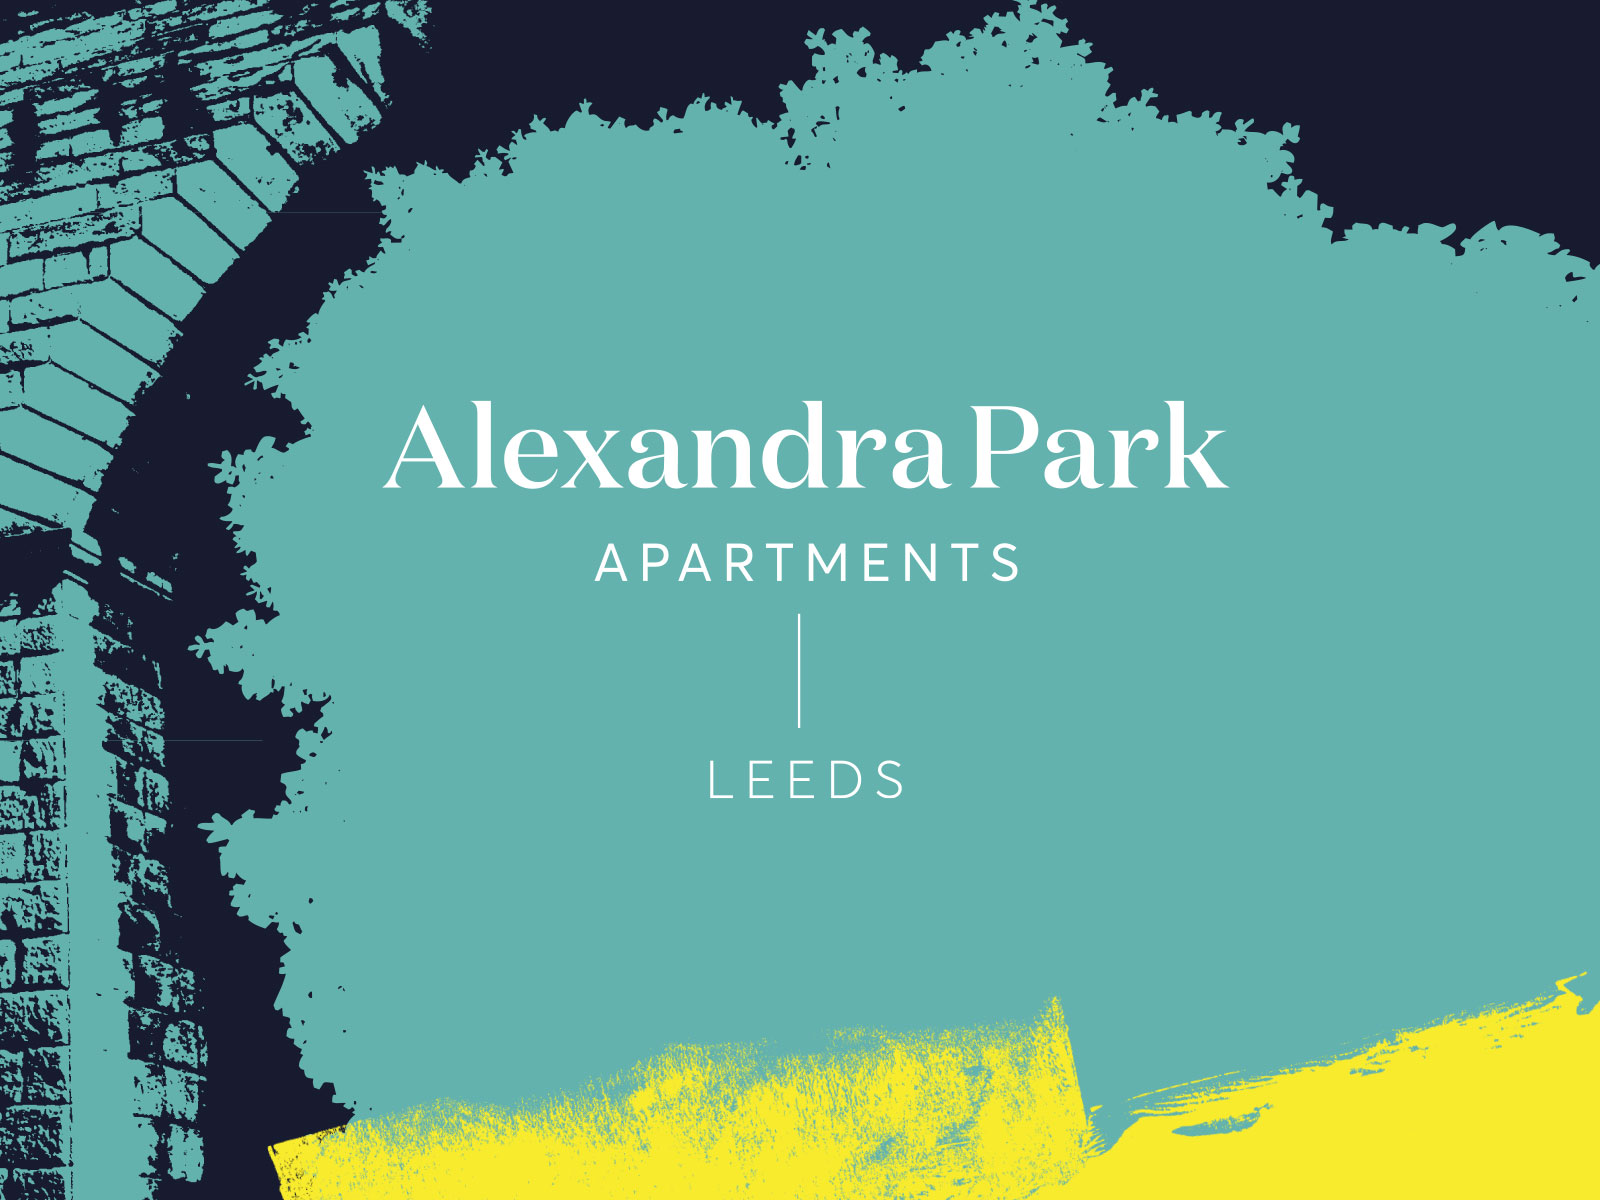 North Property Group: Alexandra Park